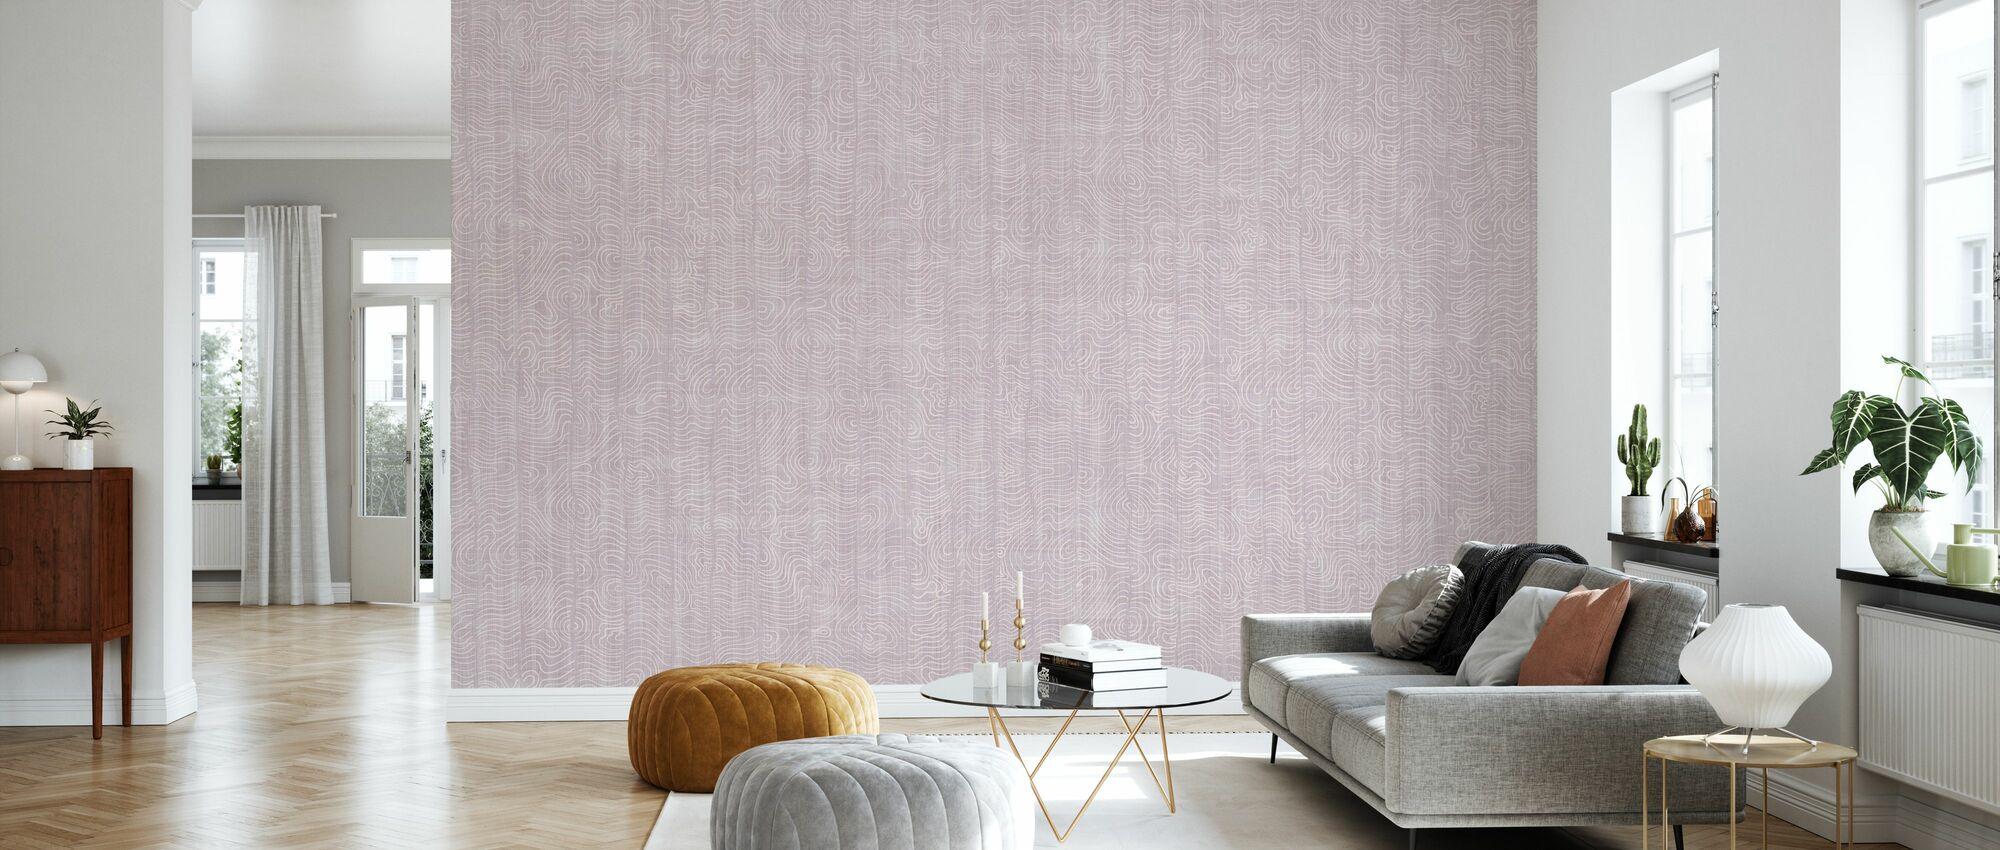 Nami - Rosie - Wallpaper - Living Room